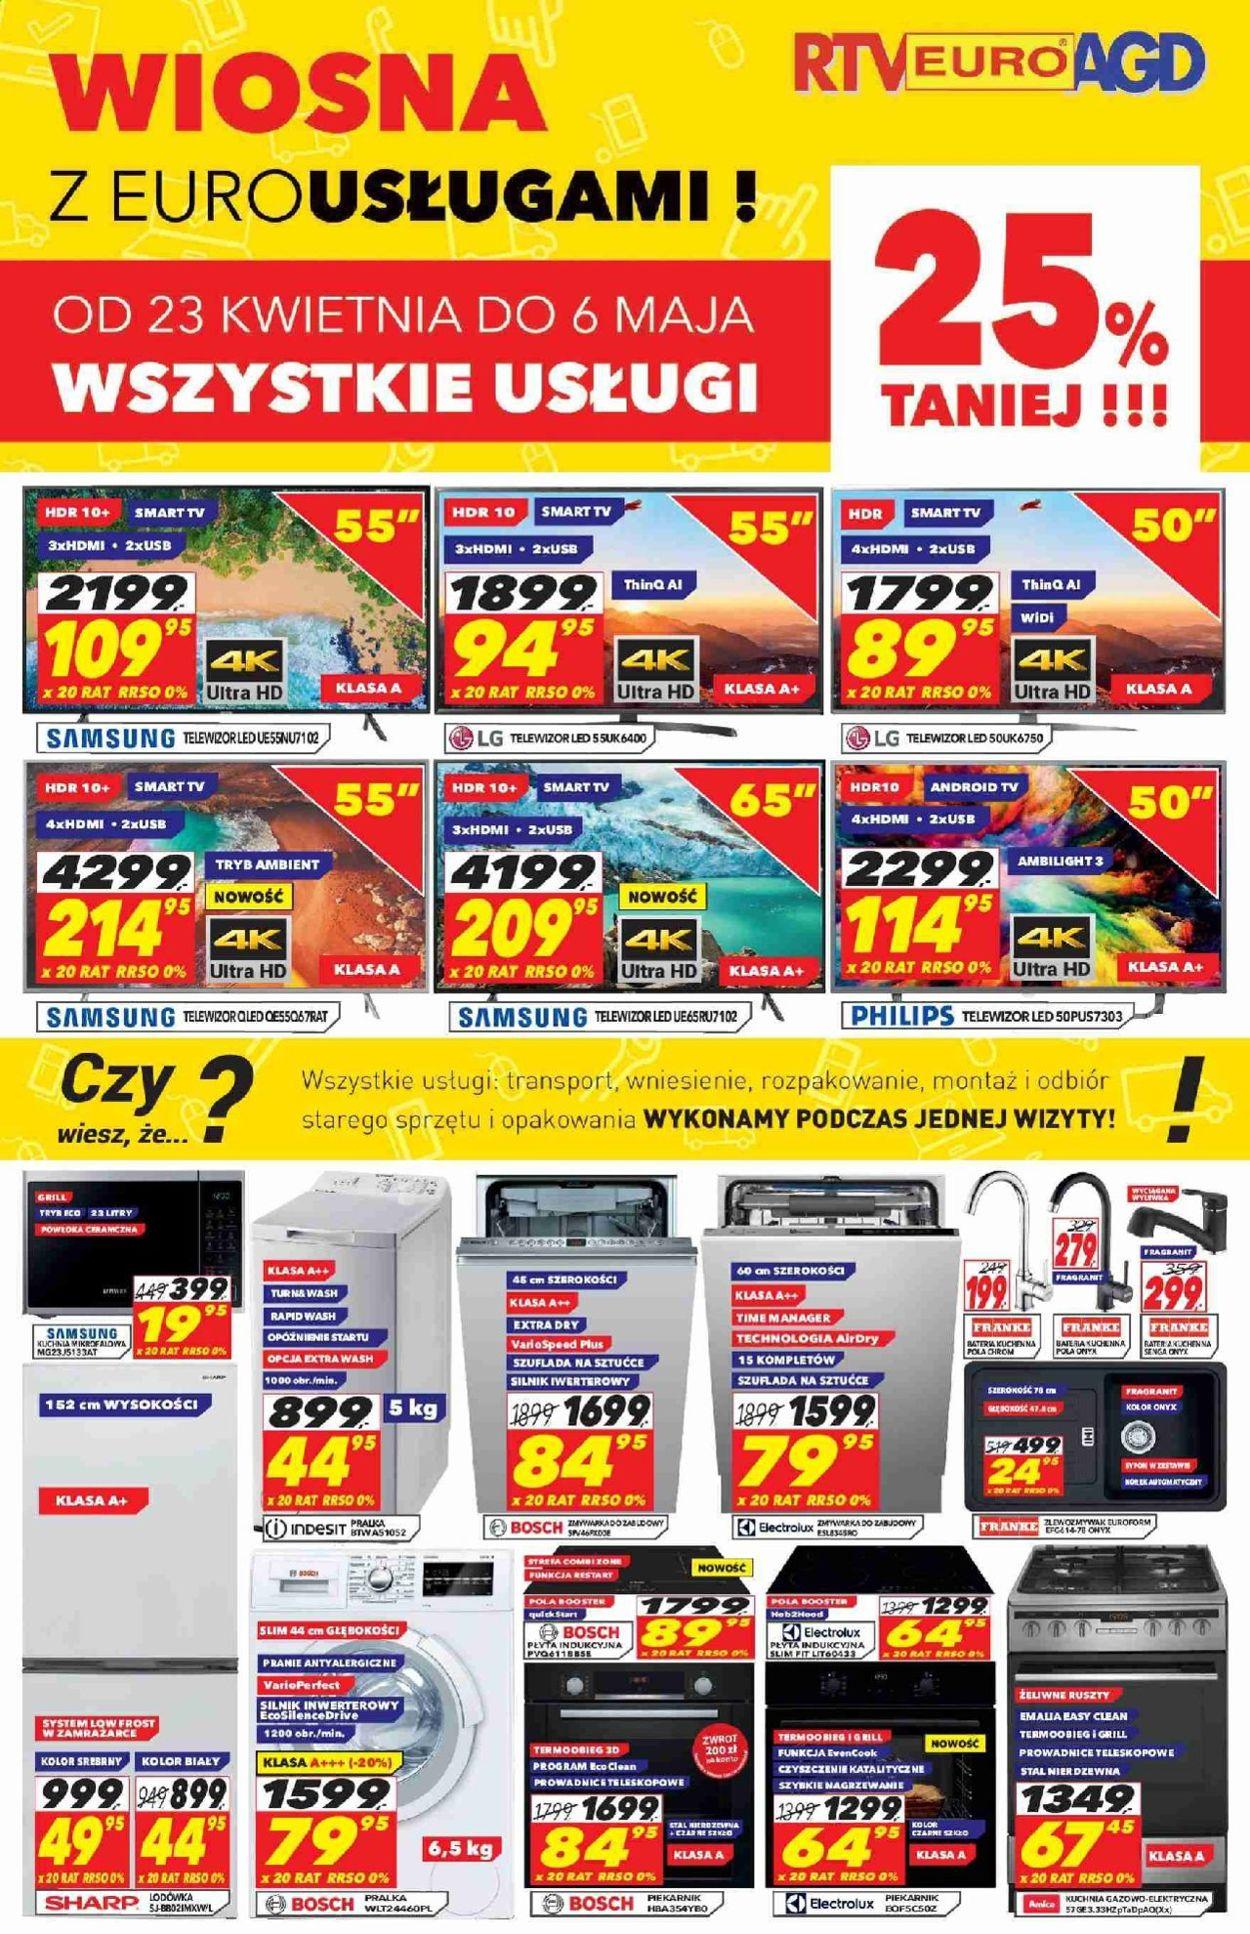 Gazetka promocyjna RTV Euro AGD - 23.04-06.05.2019